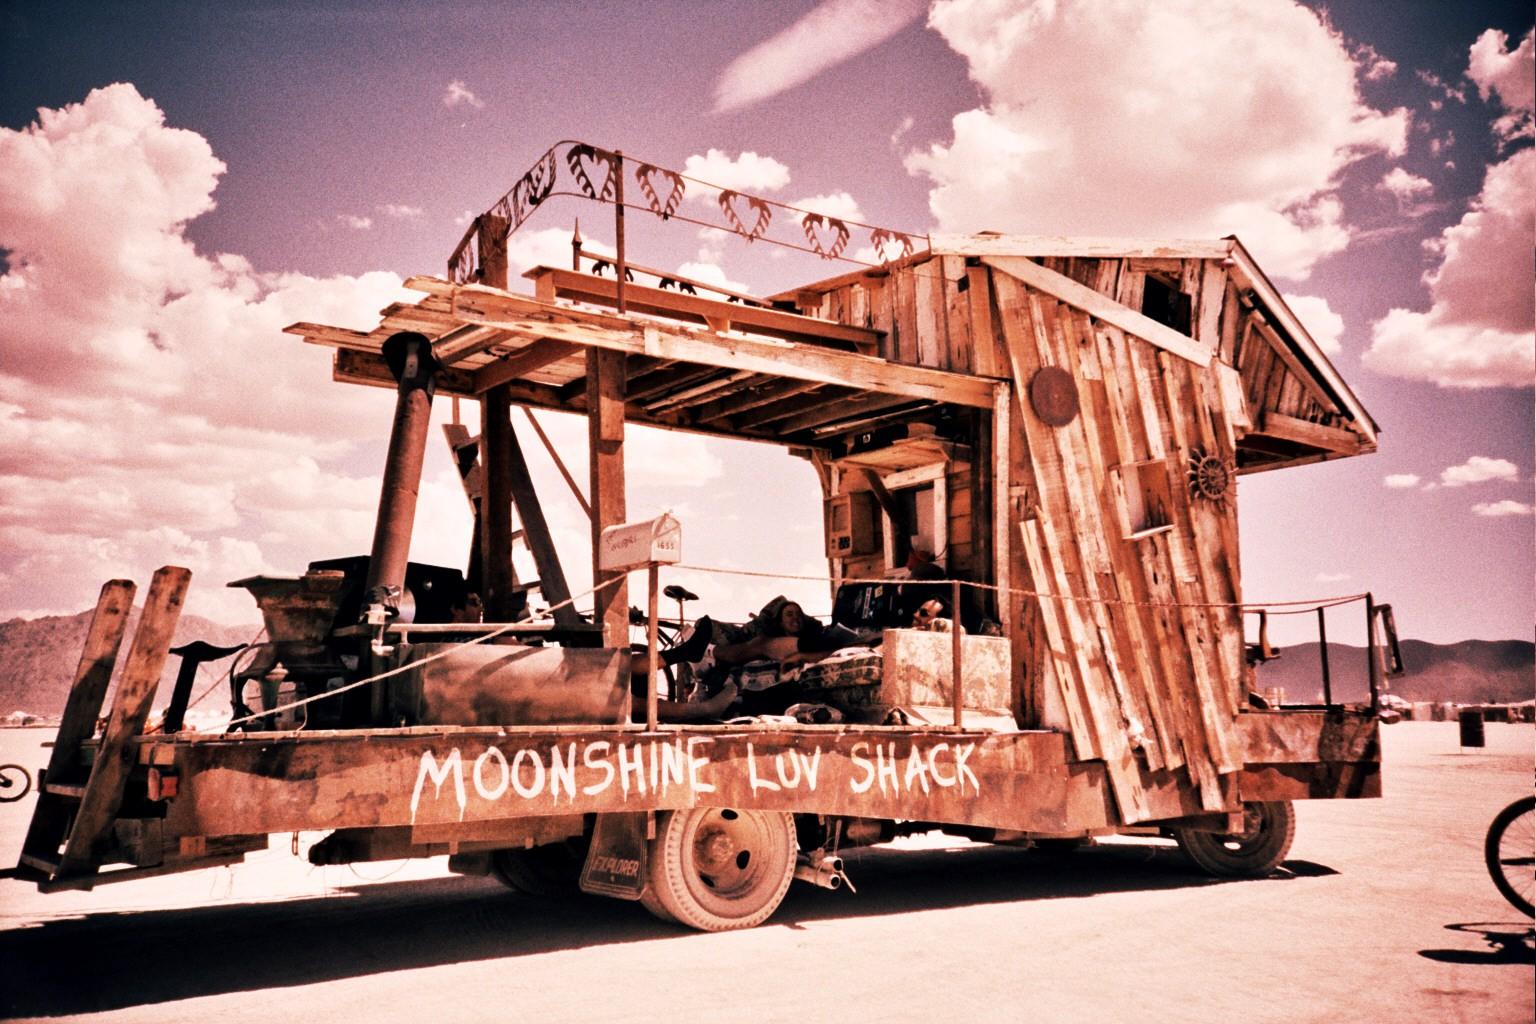 Photo of The Moonshine Luv Shack